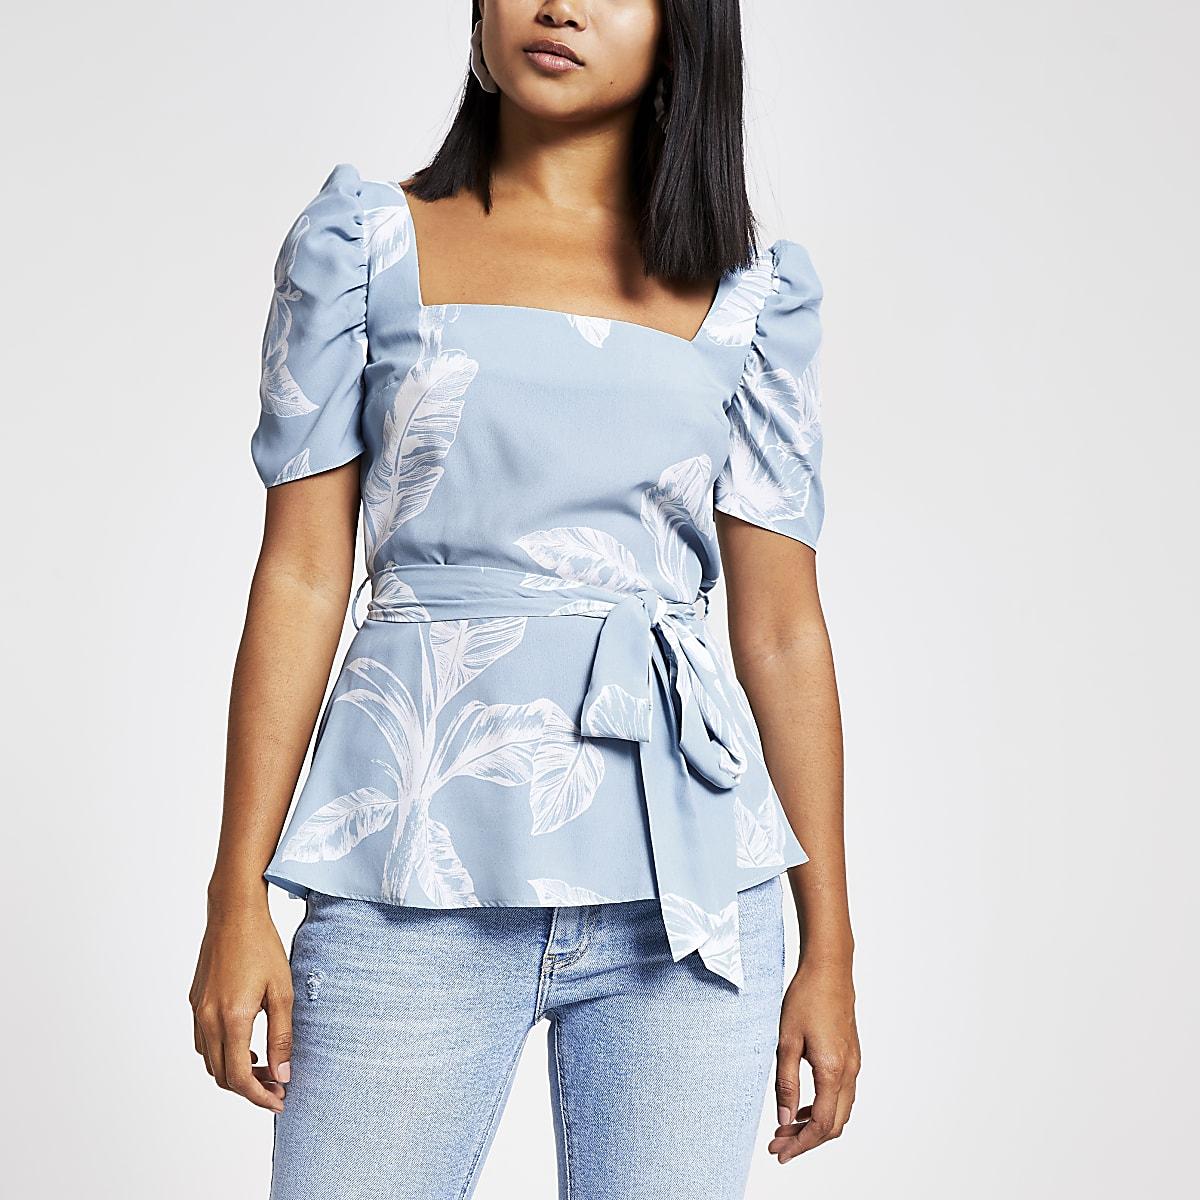 RI Petite - Blauwe top met vierkante hals en palmboomprint